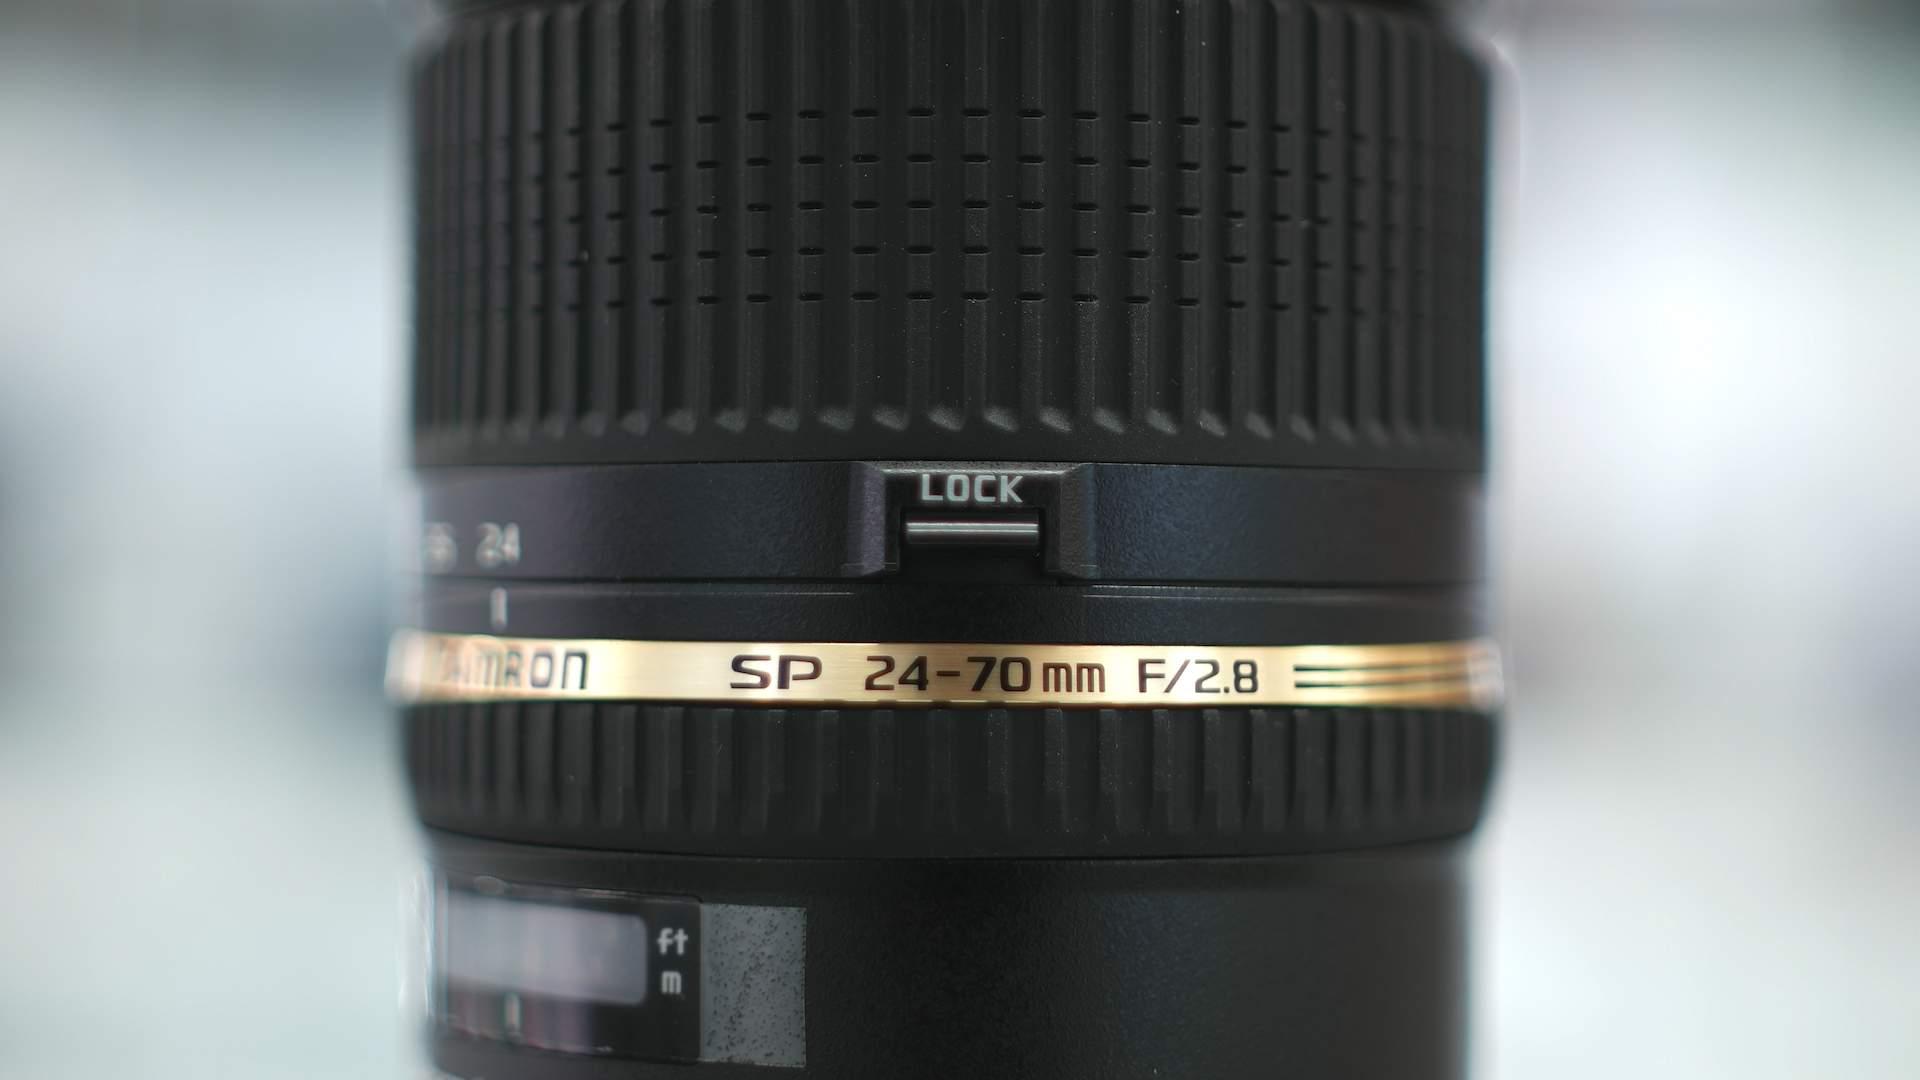 Dettaglio Lock Tamron 27-70mm f2.8